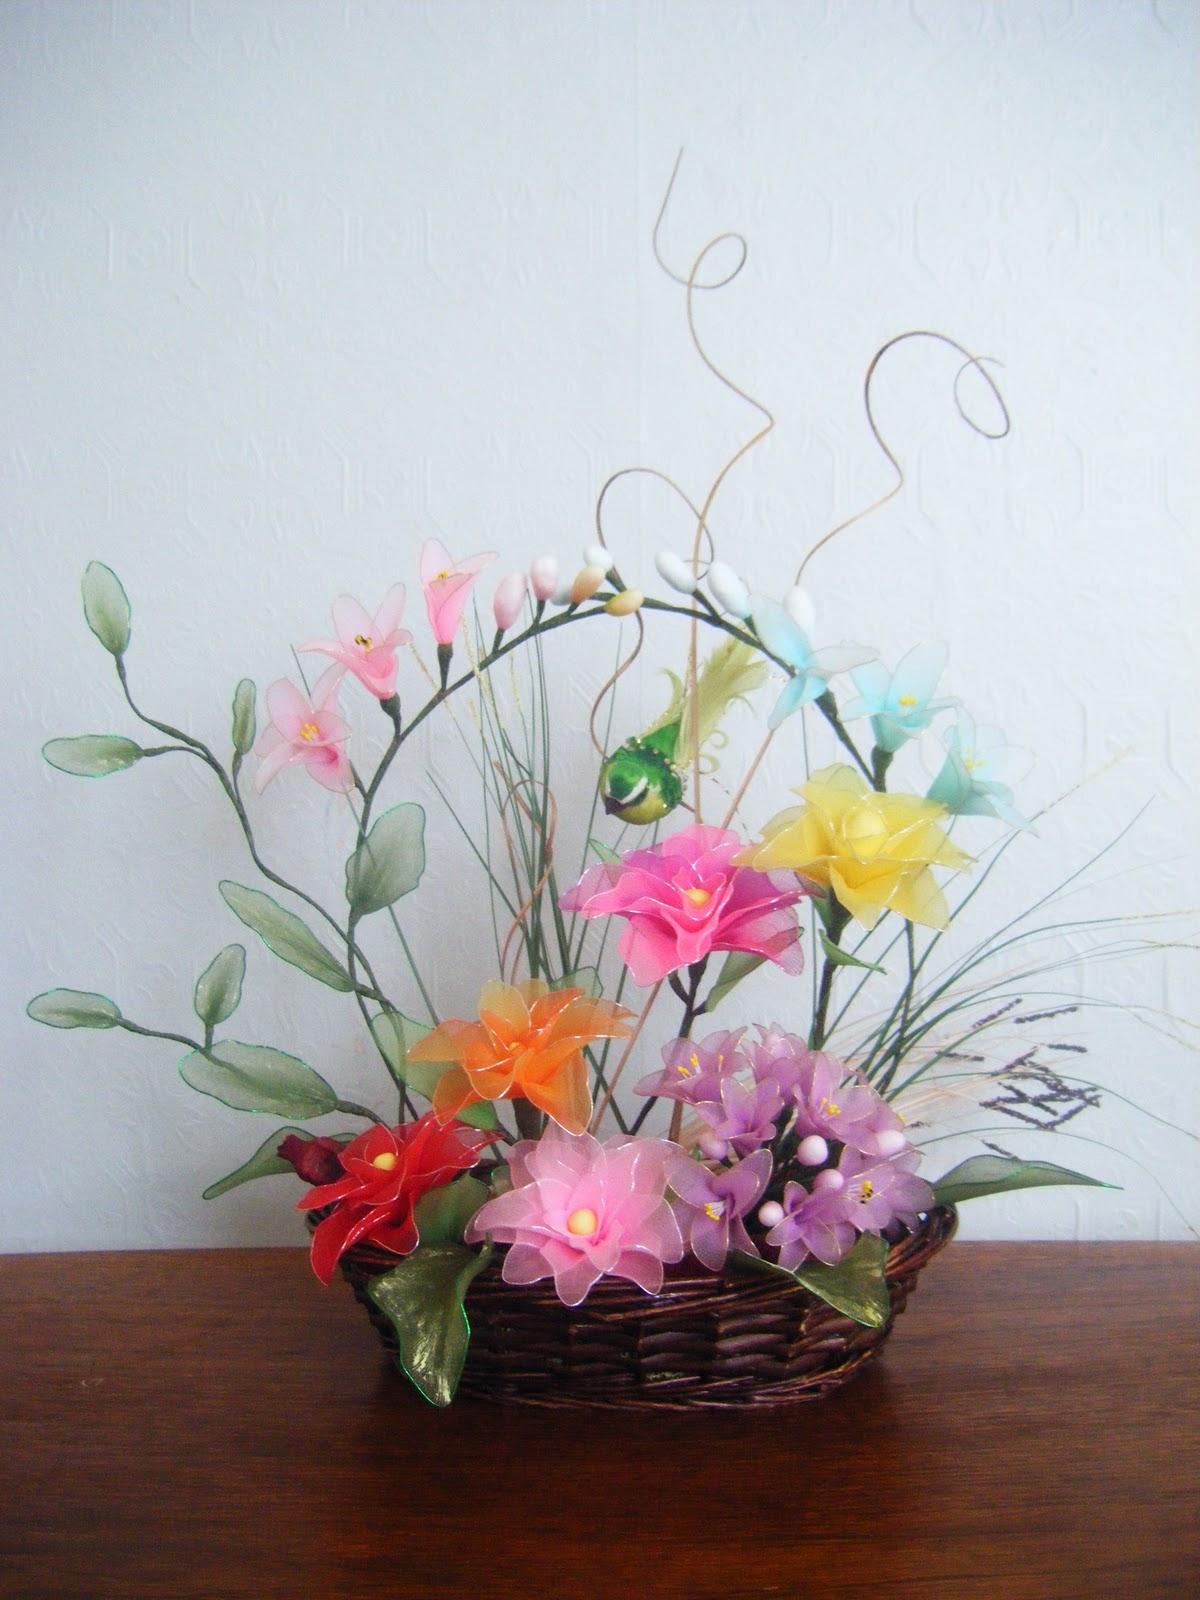 Handmade Nylon Basket : Handmade flowers nylon